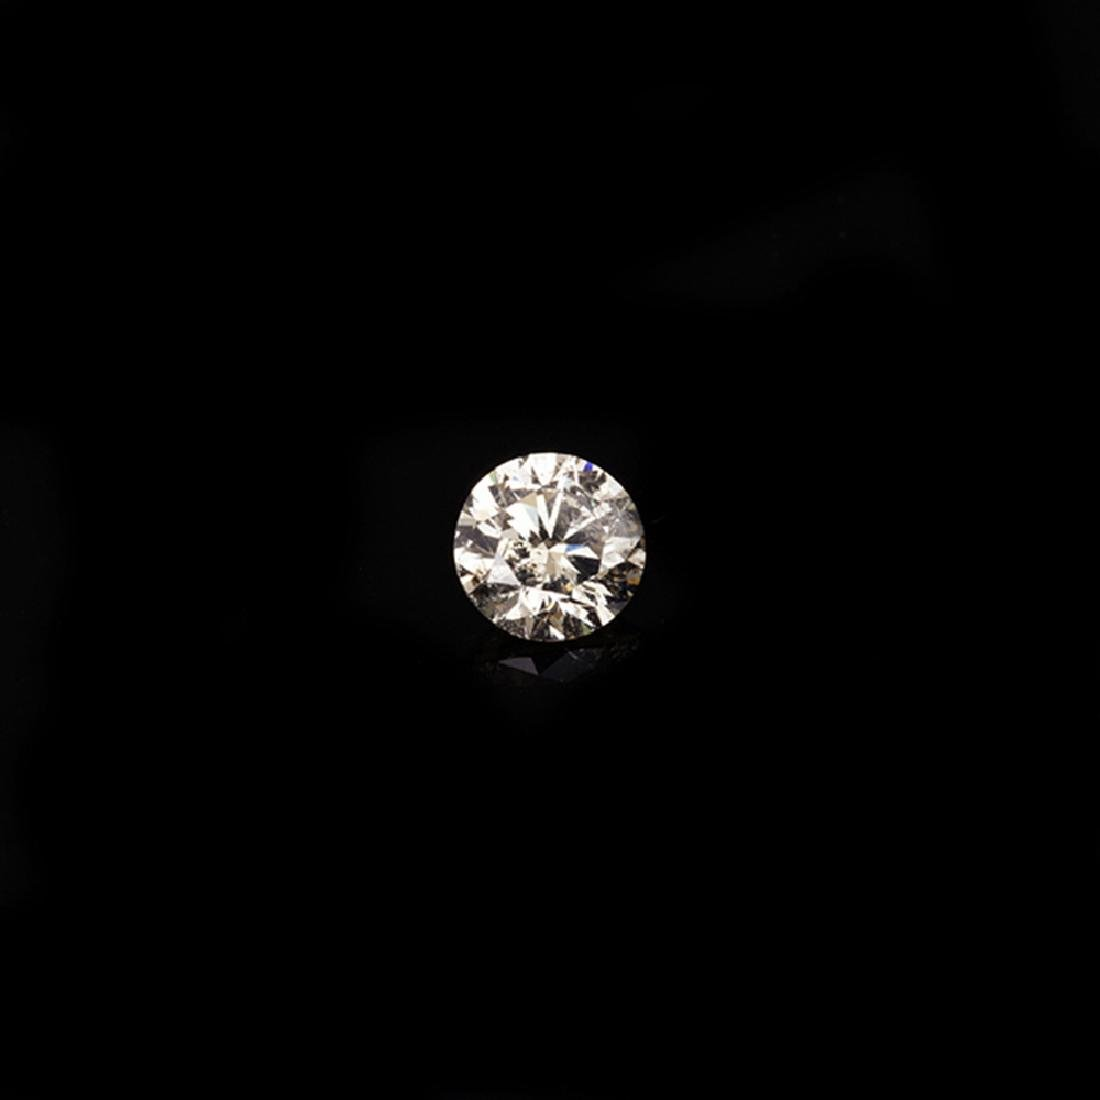 Fine Jewelry GIA Certified 0.27CT Brilliant Round Cut